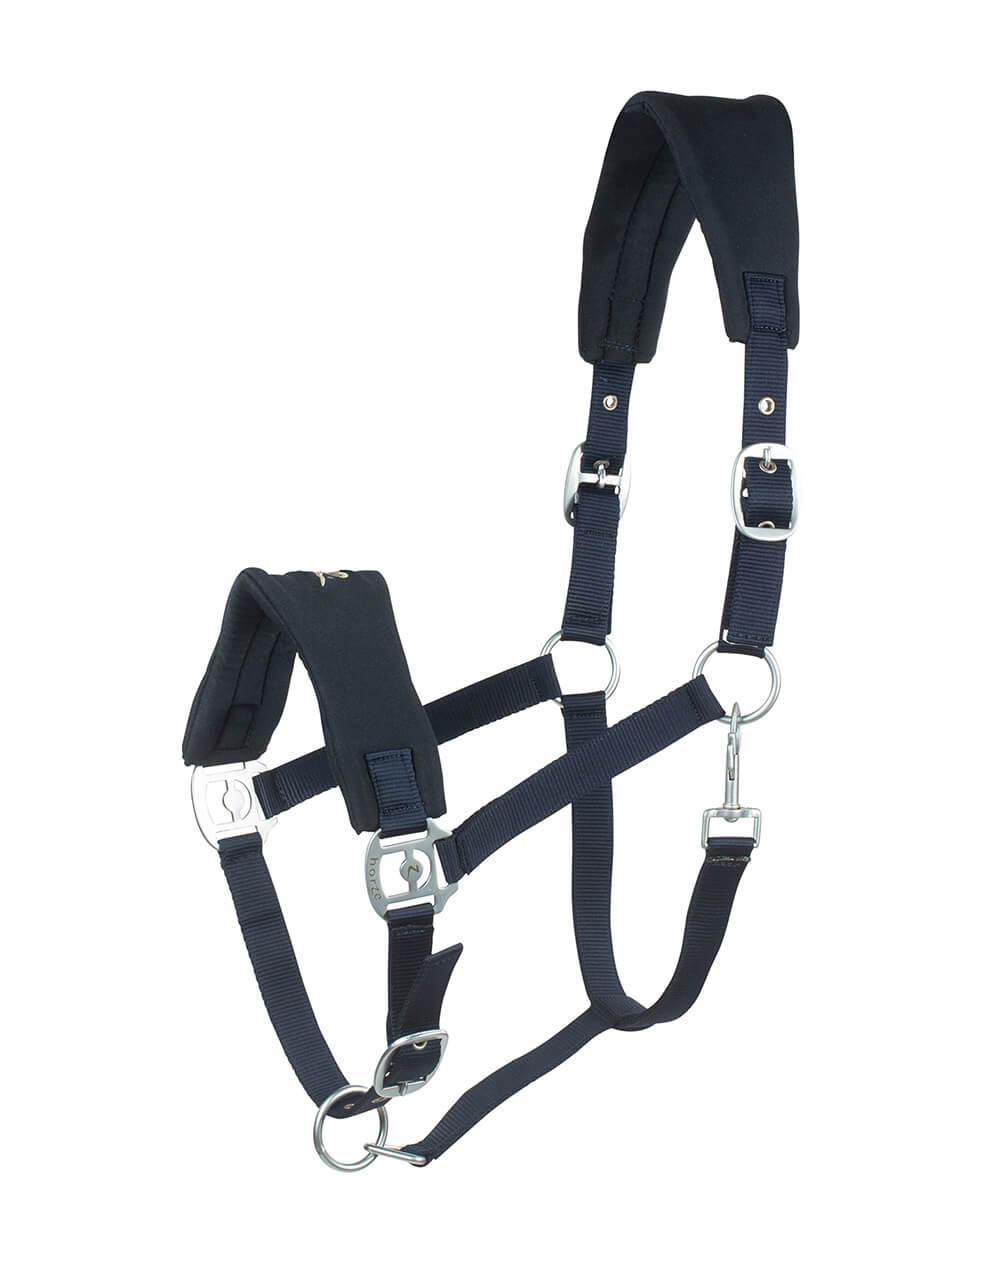 Soft padded adjustable horse halter in navy